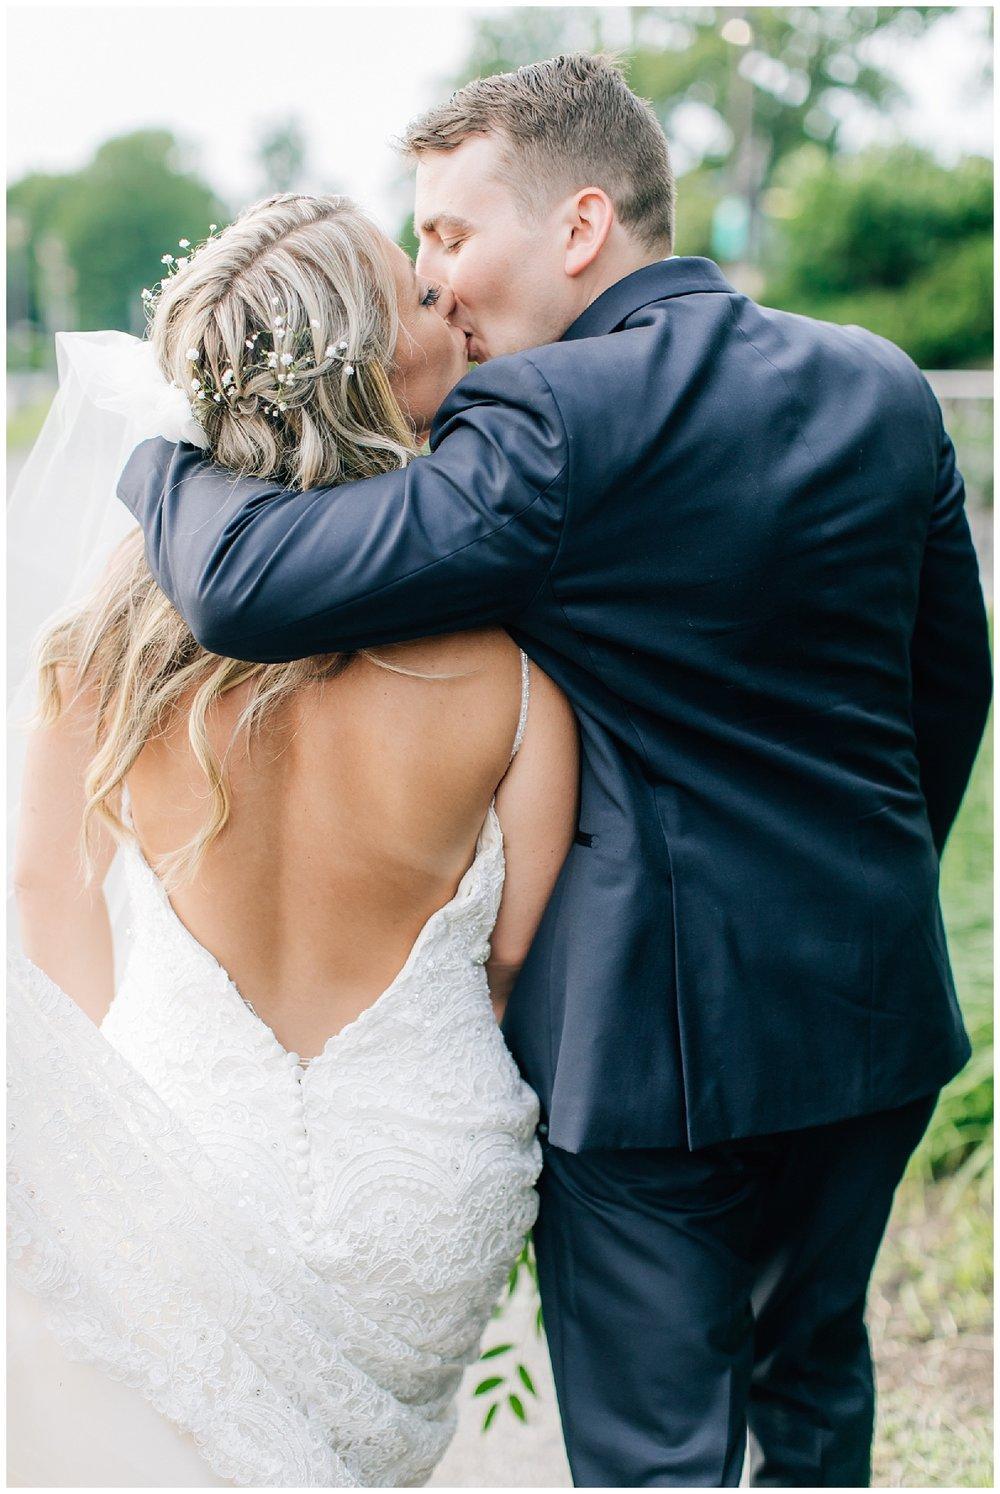 Steph Eric Philly Waterworks Wedding_0021.jpg